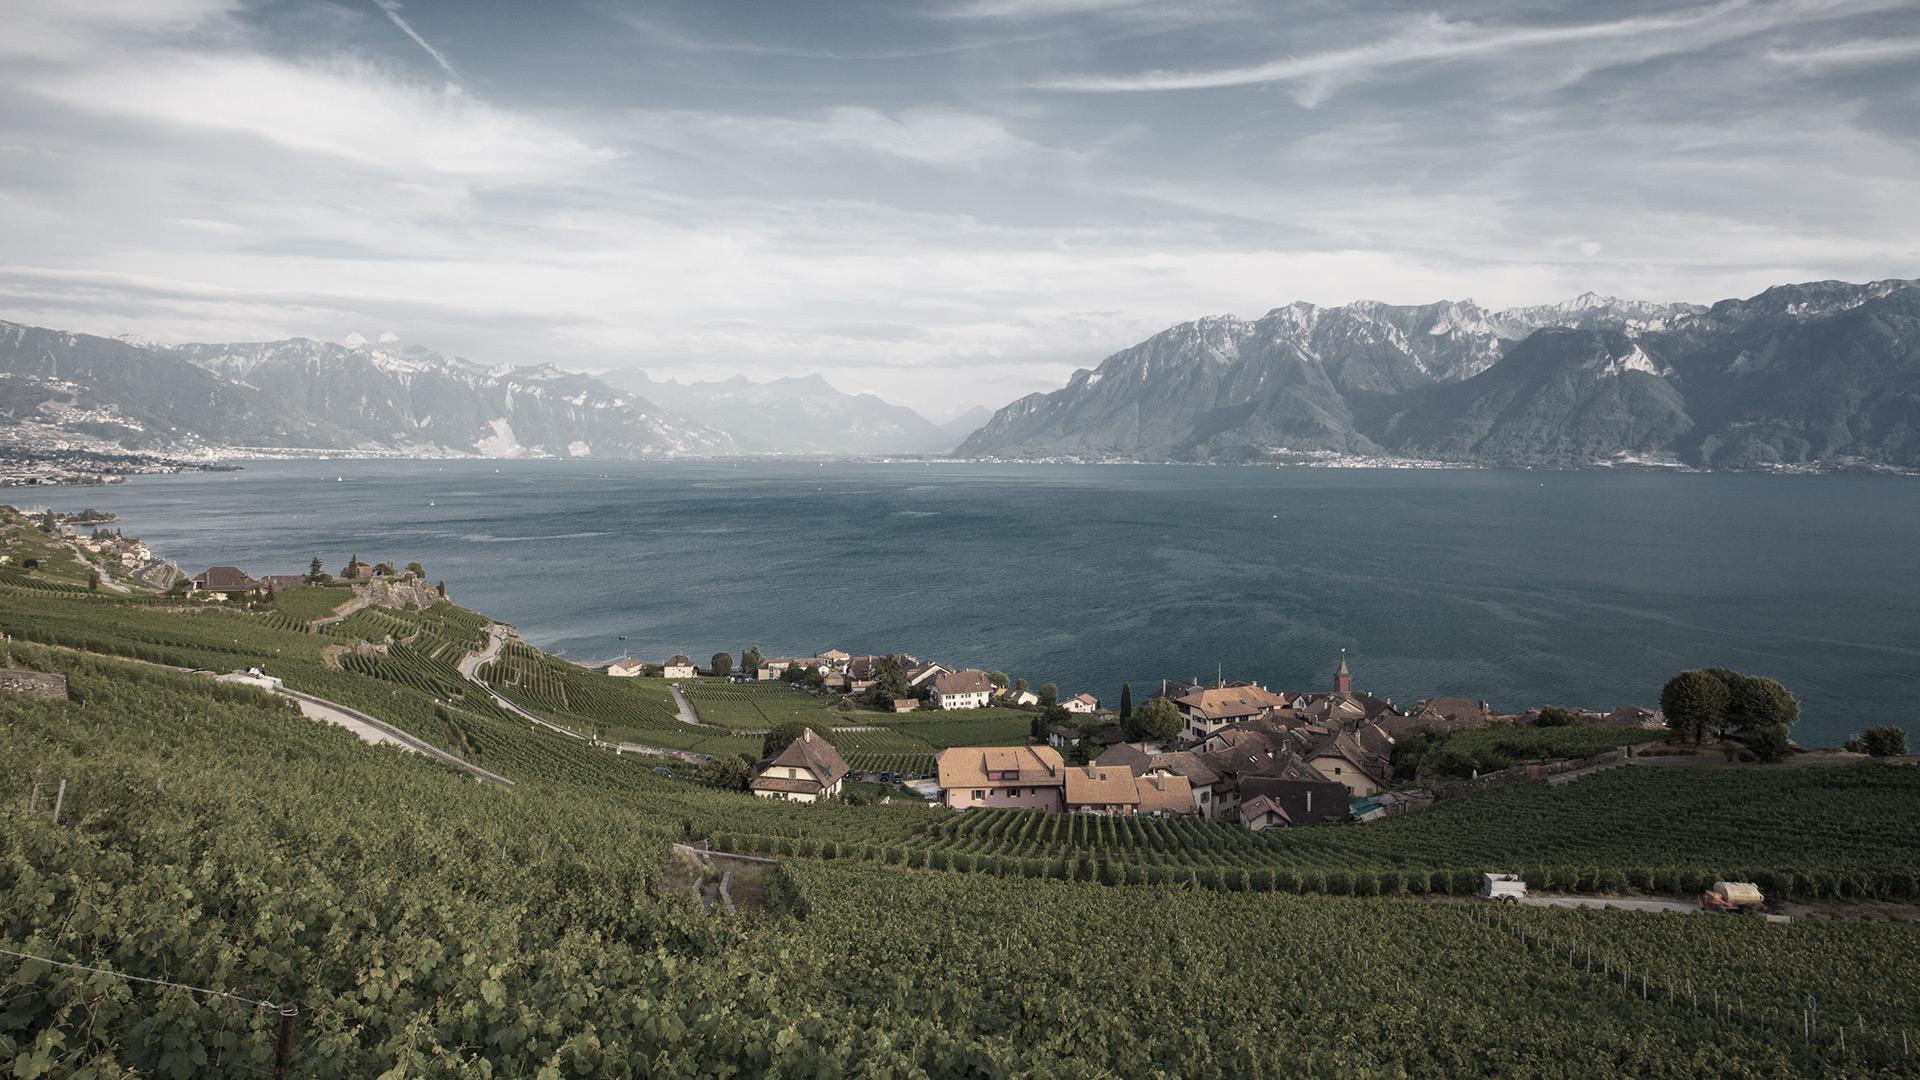 Swiss craftmanship